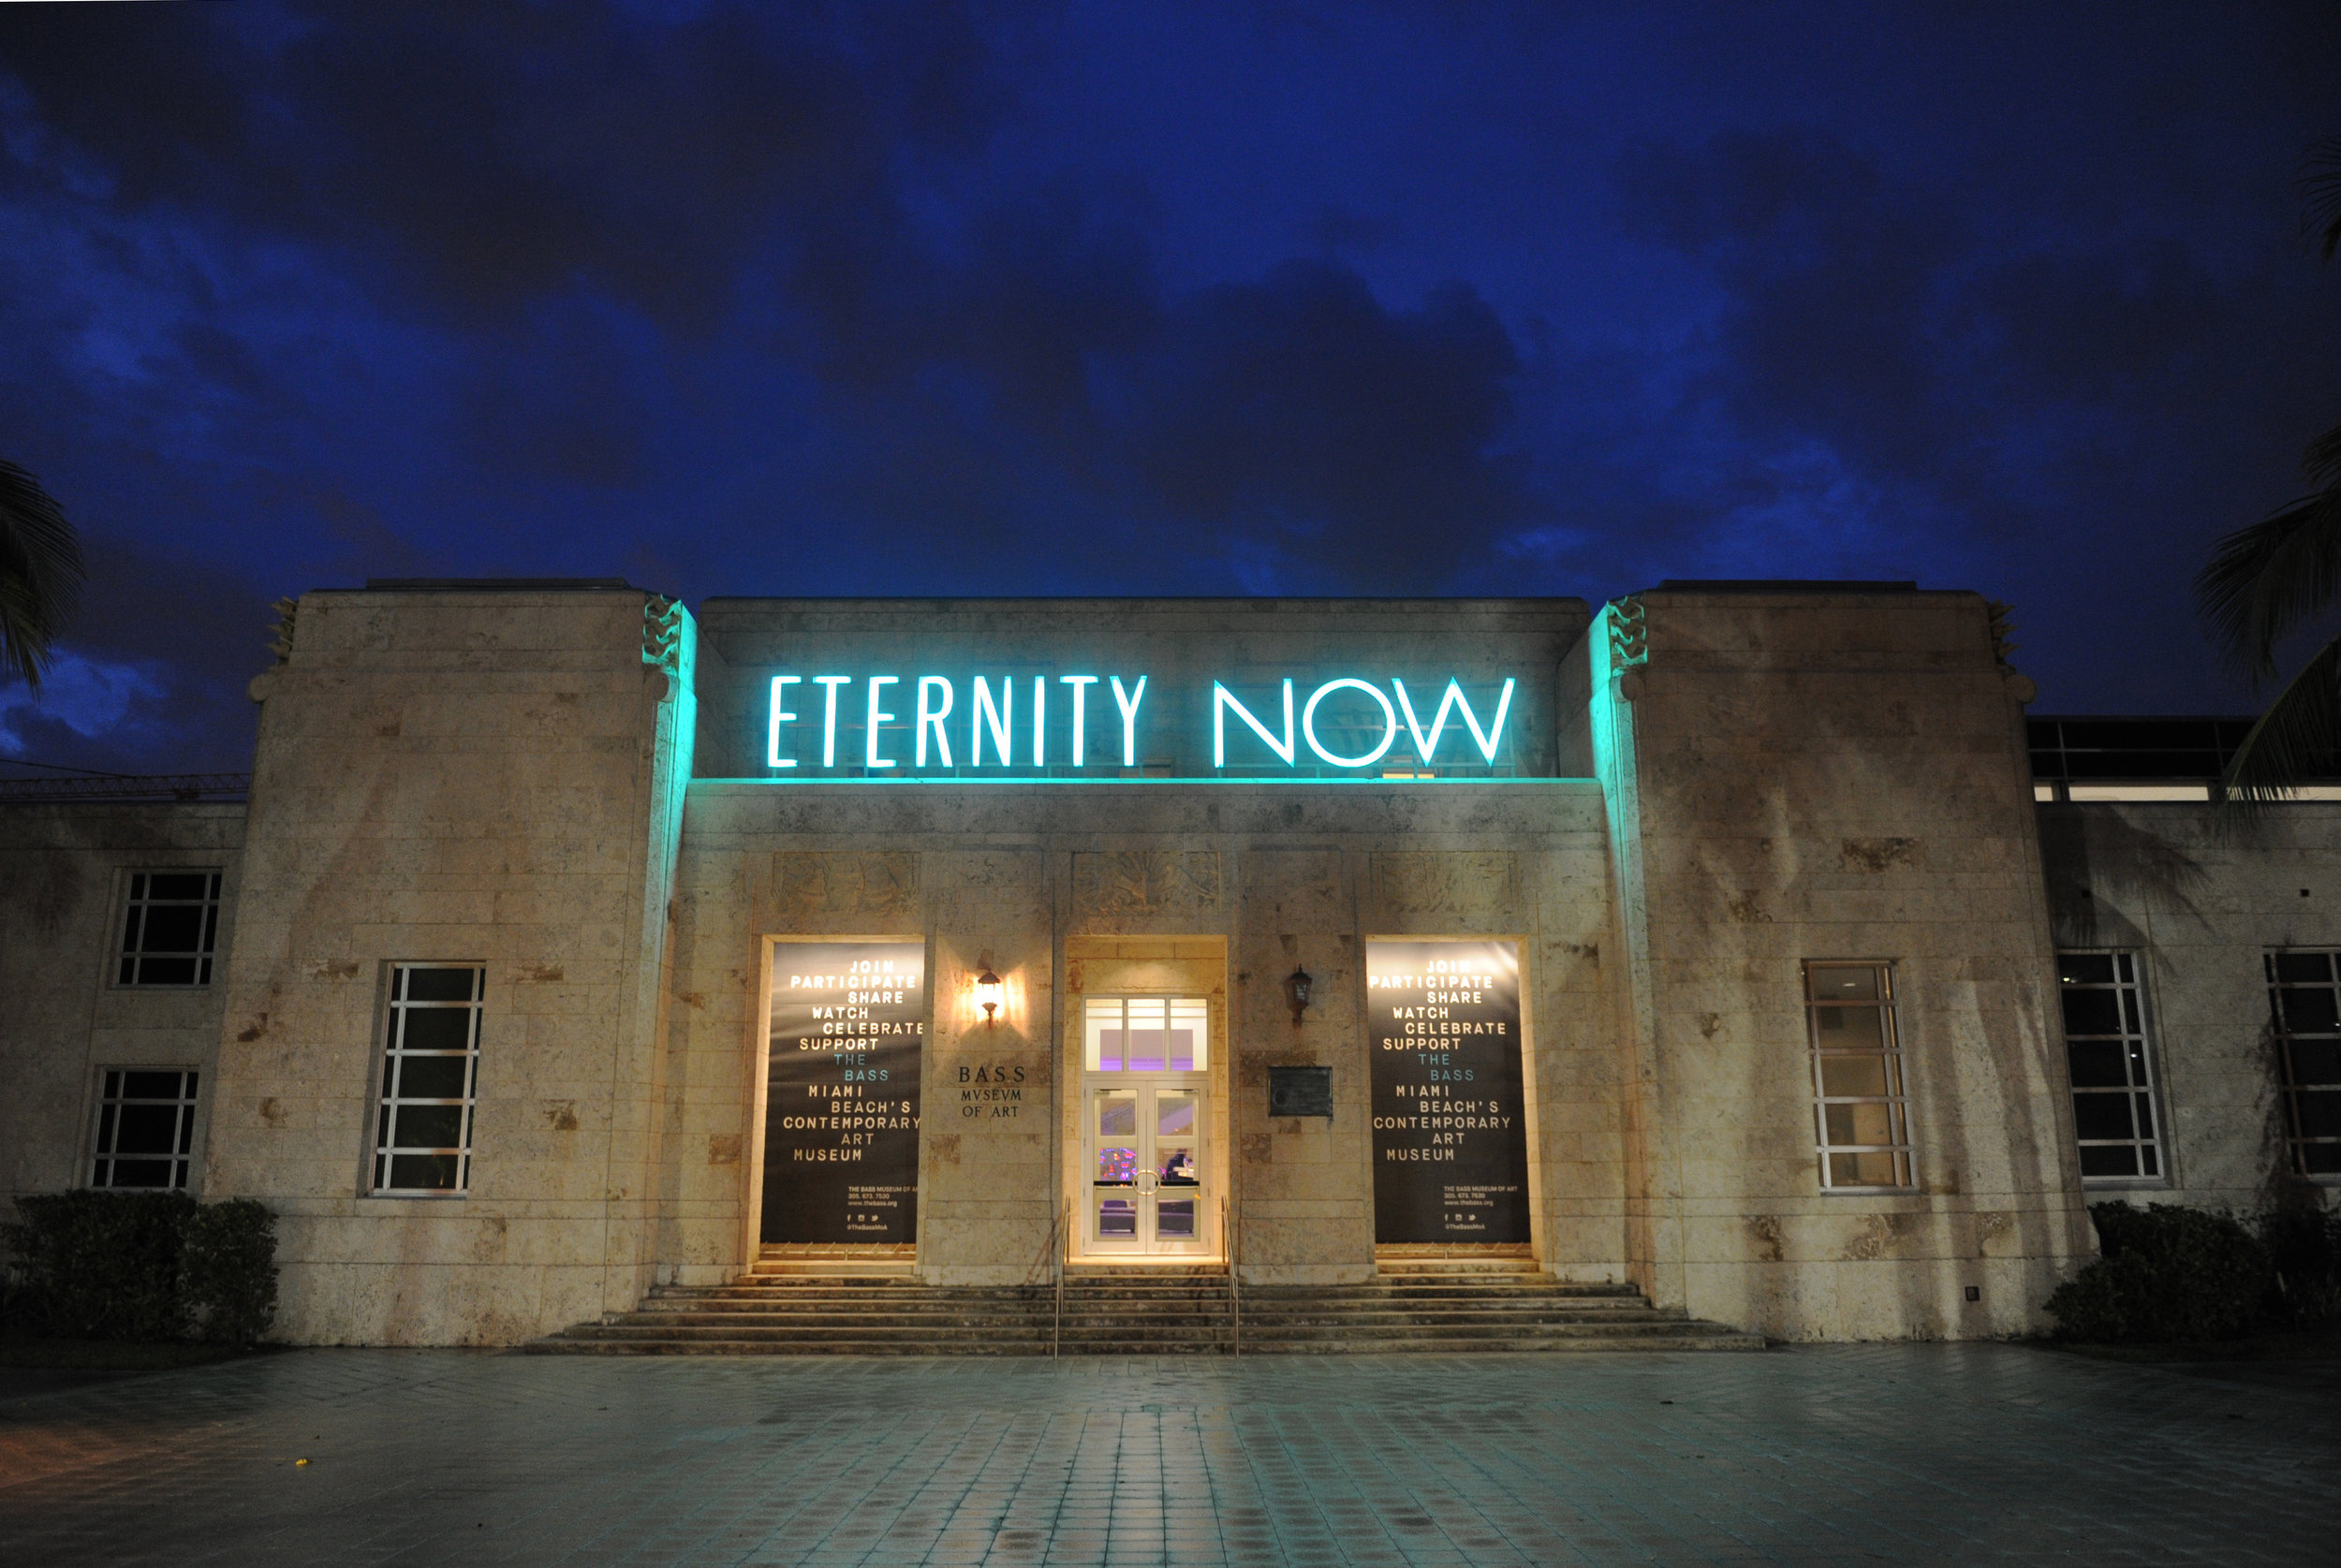 Entrance the eye of eternity